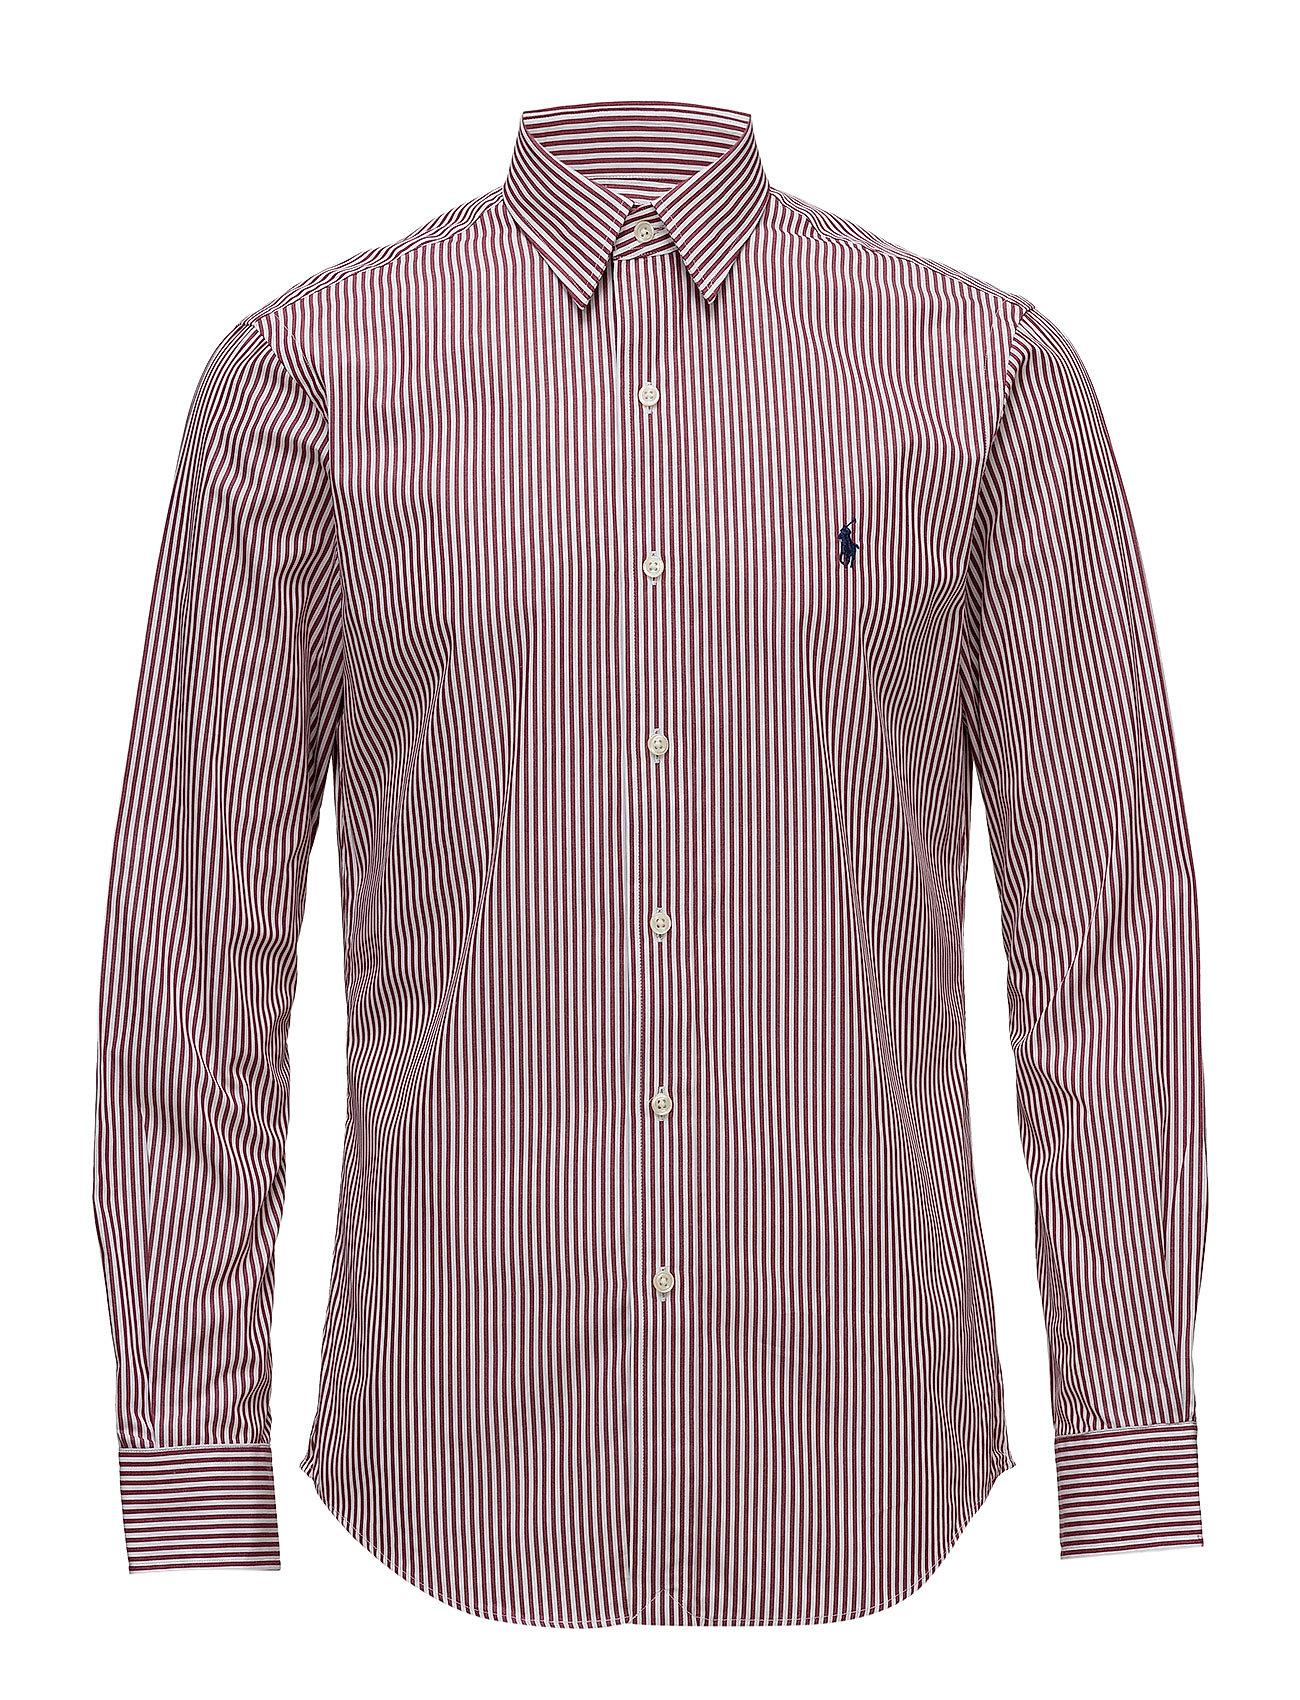 Polo Ralph Lauren Slim Fit Striped Poplin Shirt